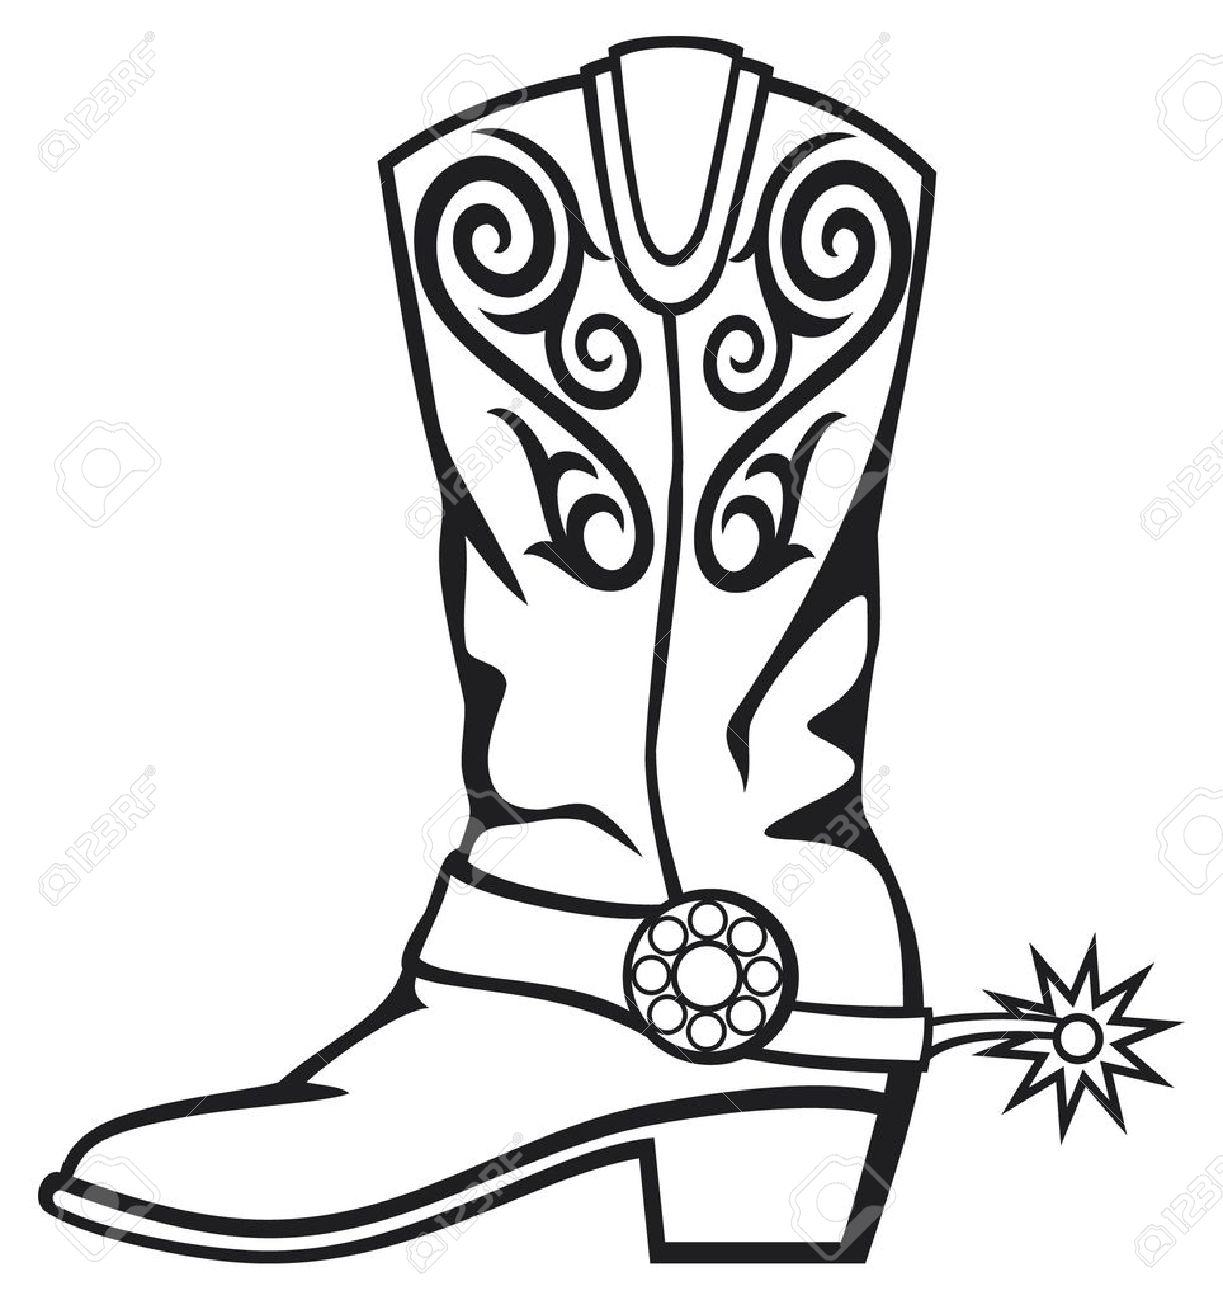 Clipart Cowgirl Boots - .-Clipart cowgirl boots - .-2